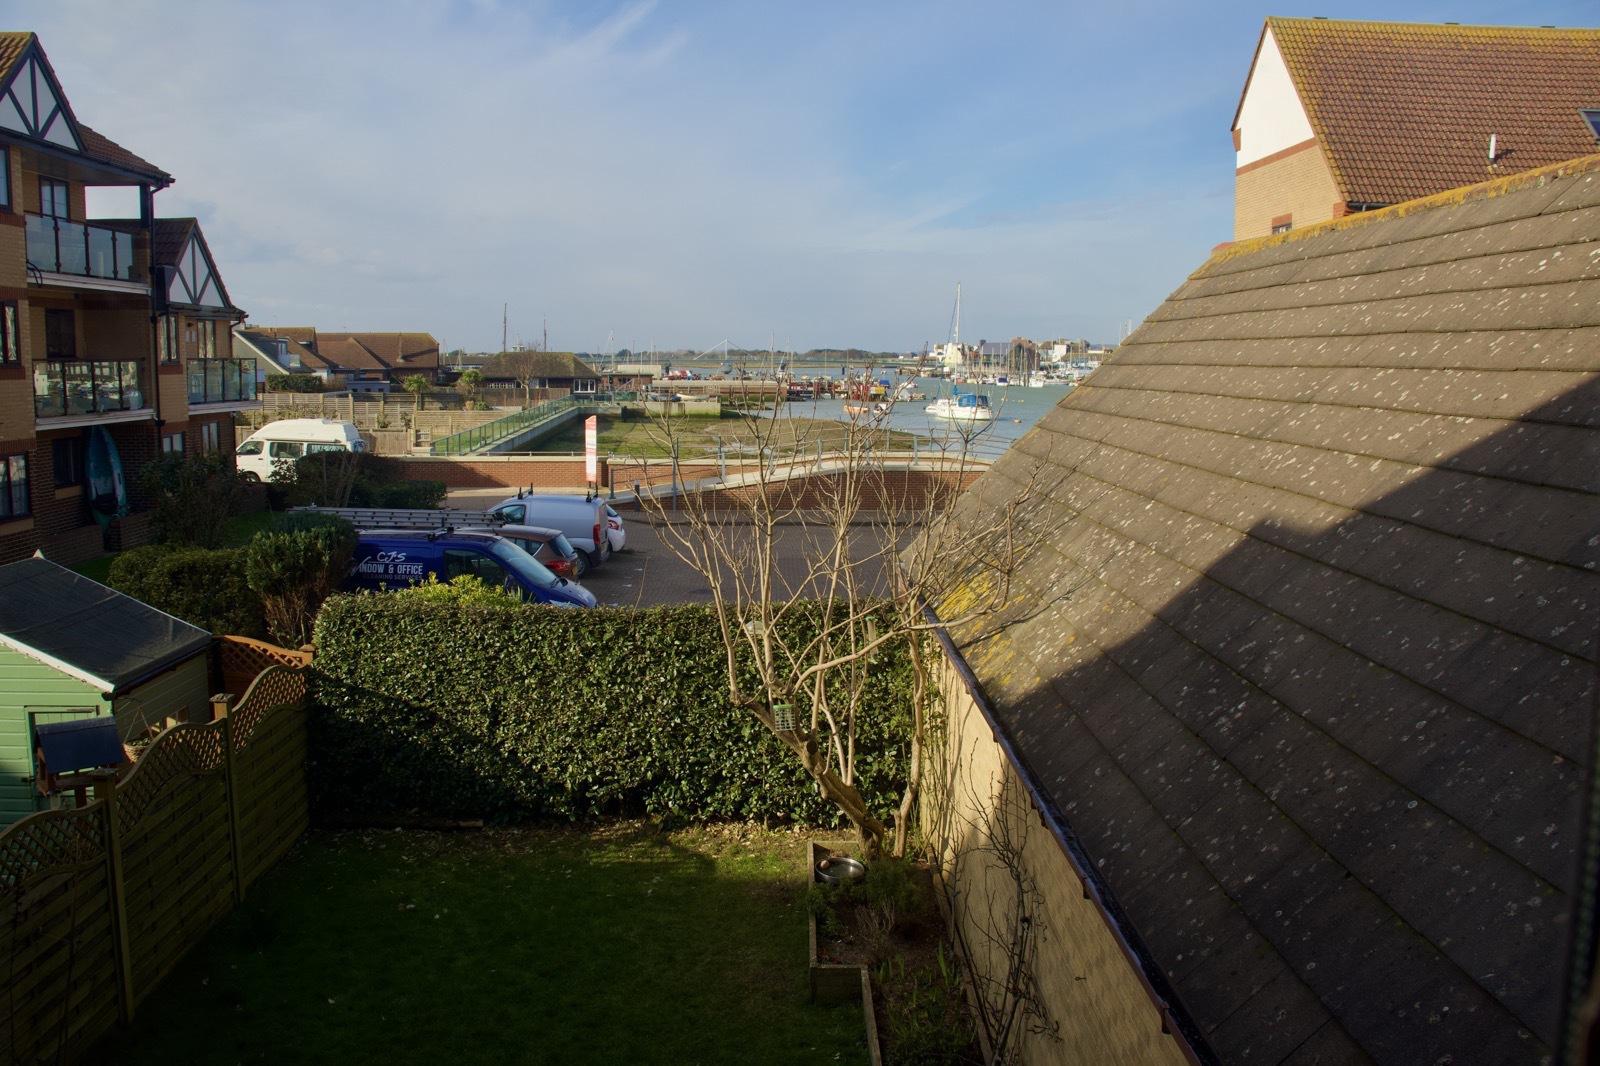 Shoreham through an 18mm Canon M lens